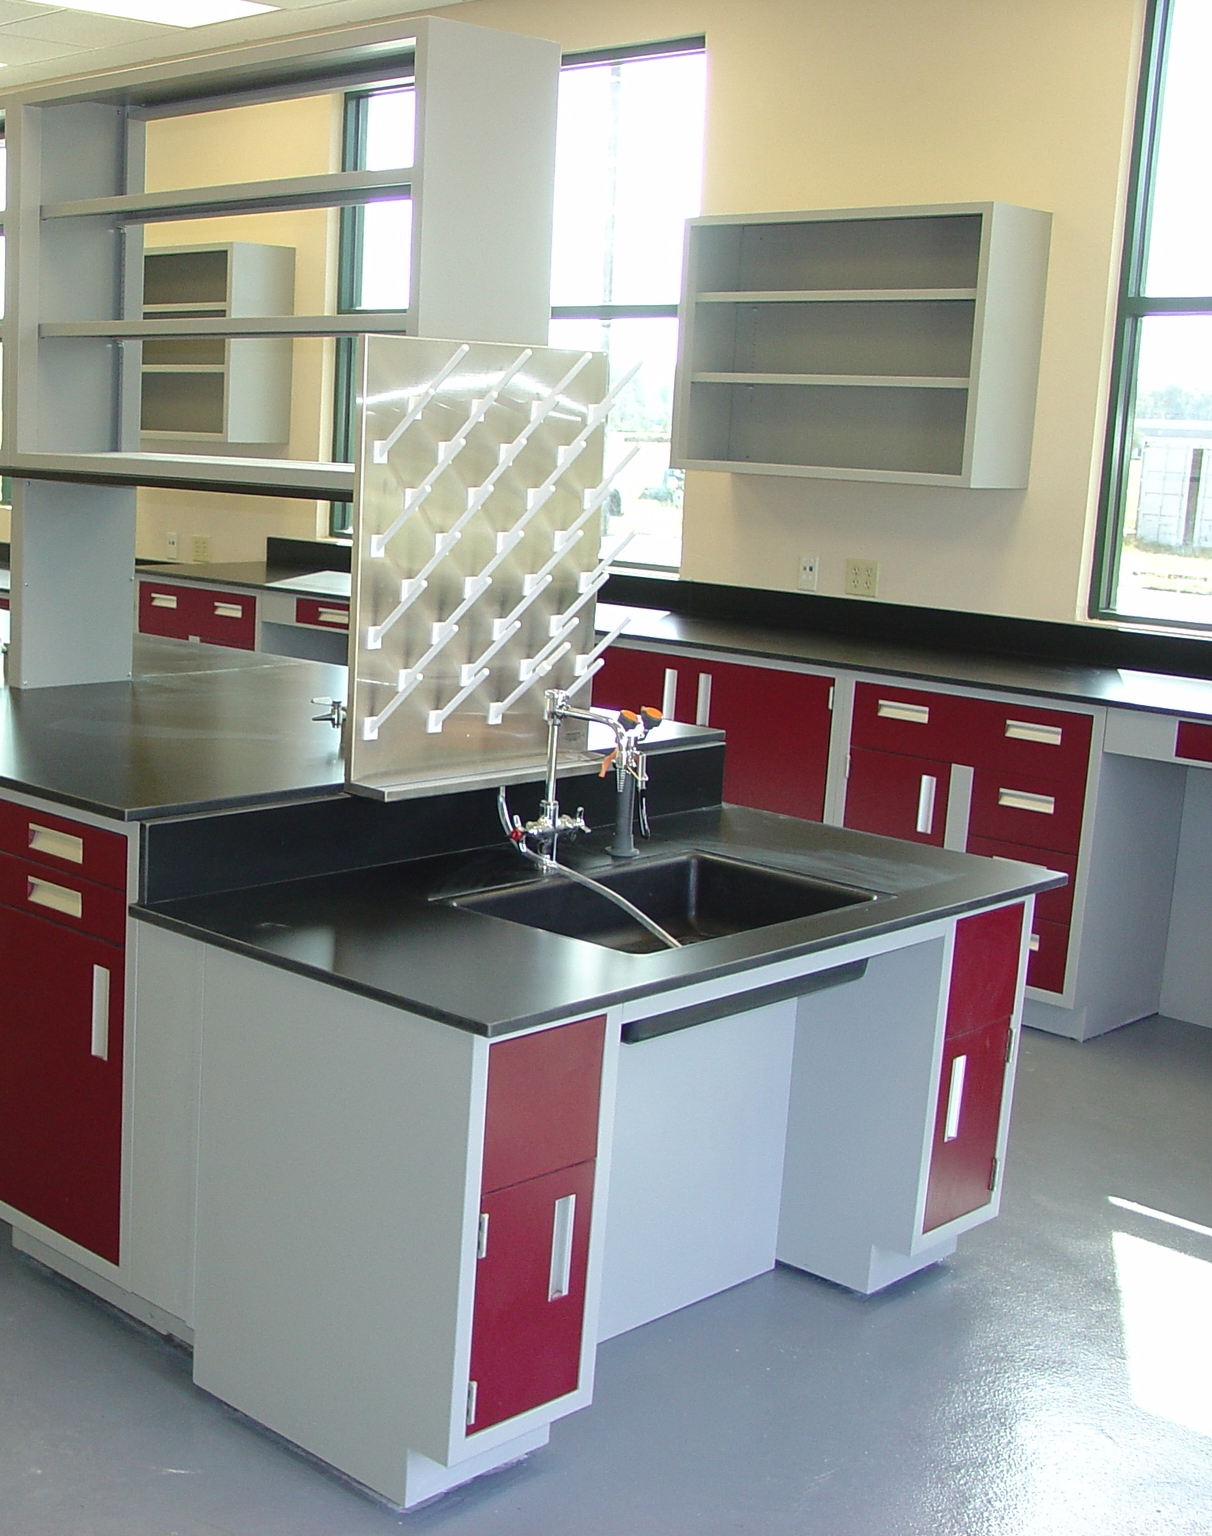 Laboratory Countertops & Sinks | LOC Scientific